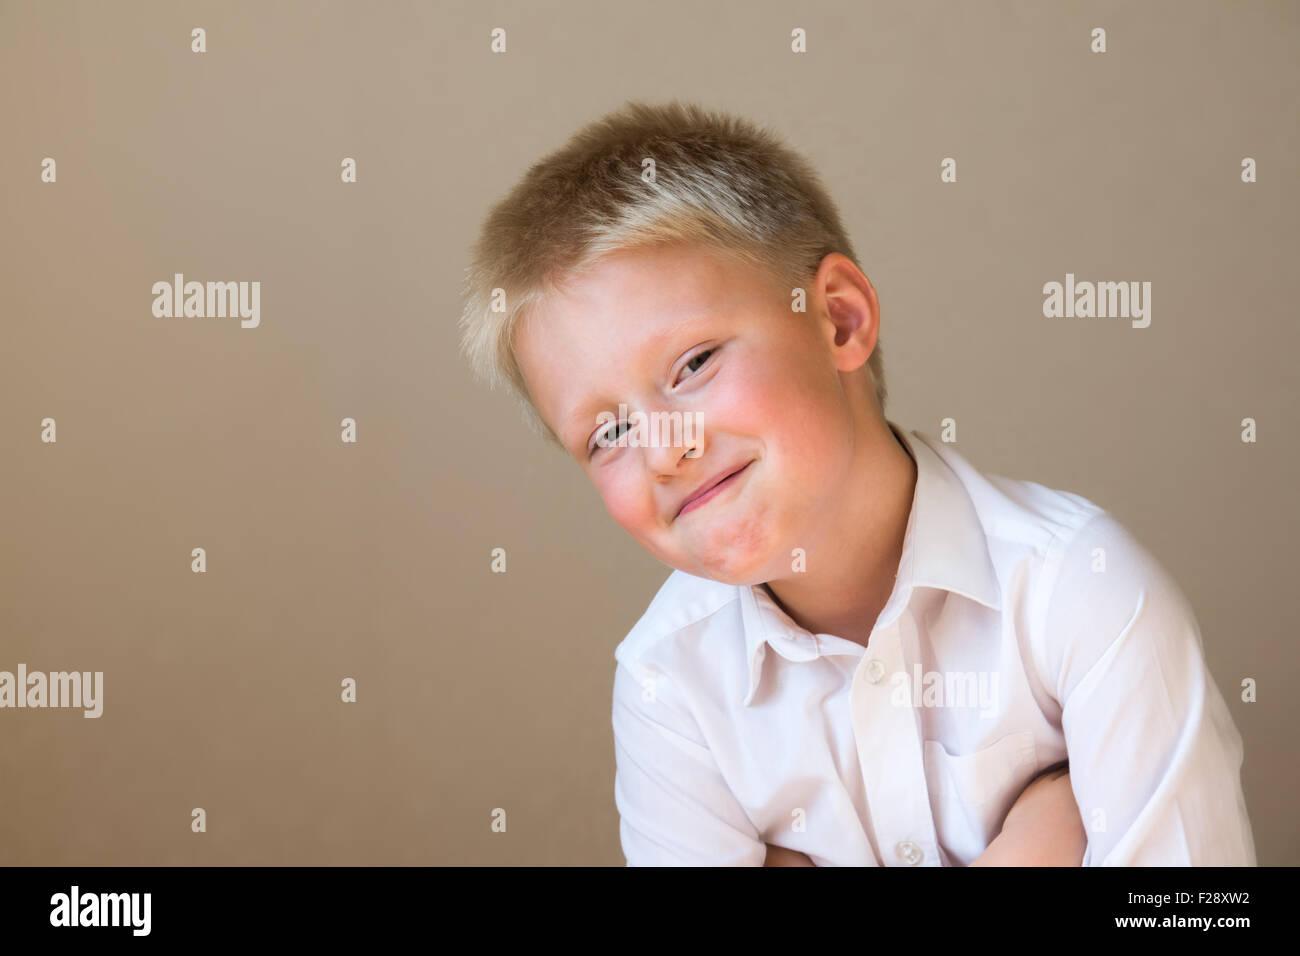 Cunning sly smiling happy enfant intelligent garçon sur fond gris Photo Stock